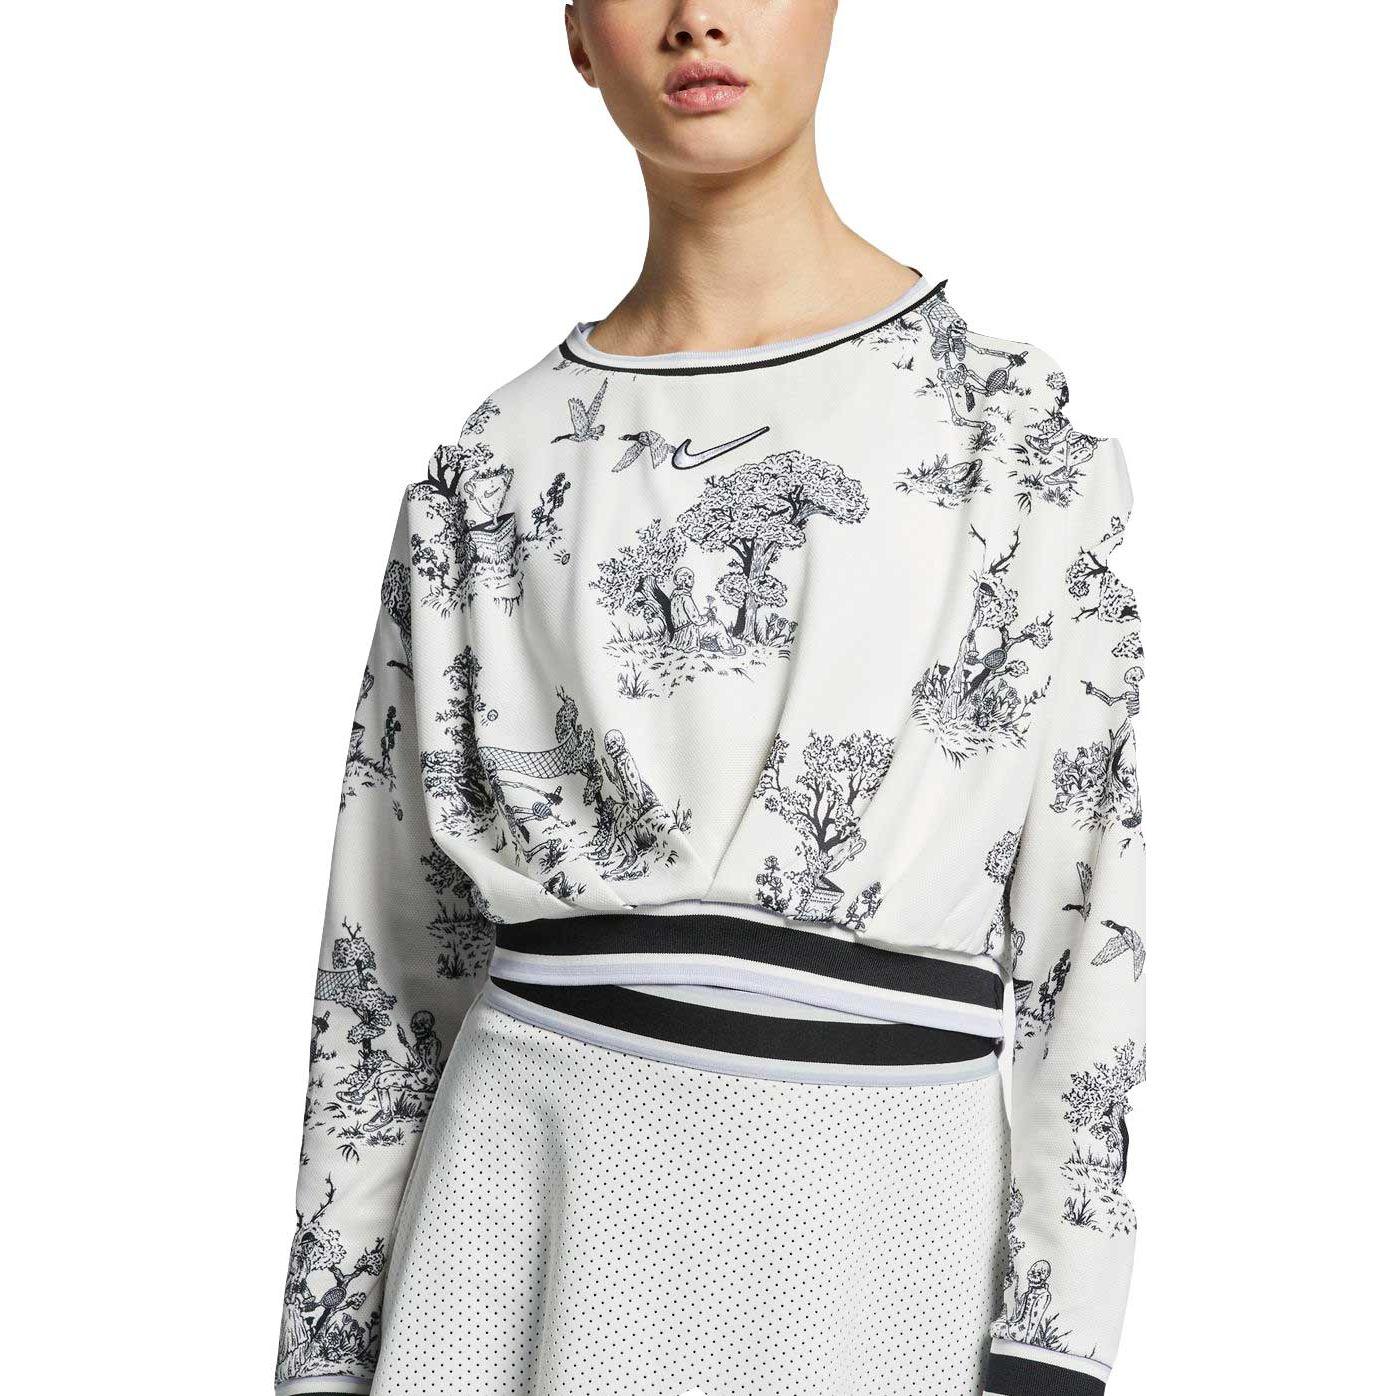 Nike Women's Dri-FIT Skull Print Tennis Long Sleeve Shirt